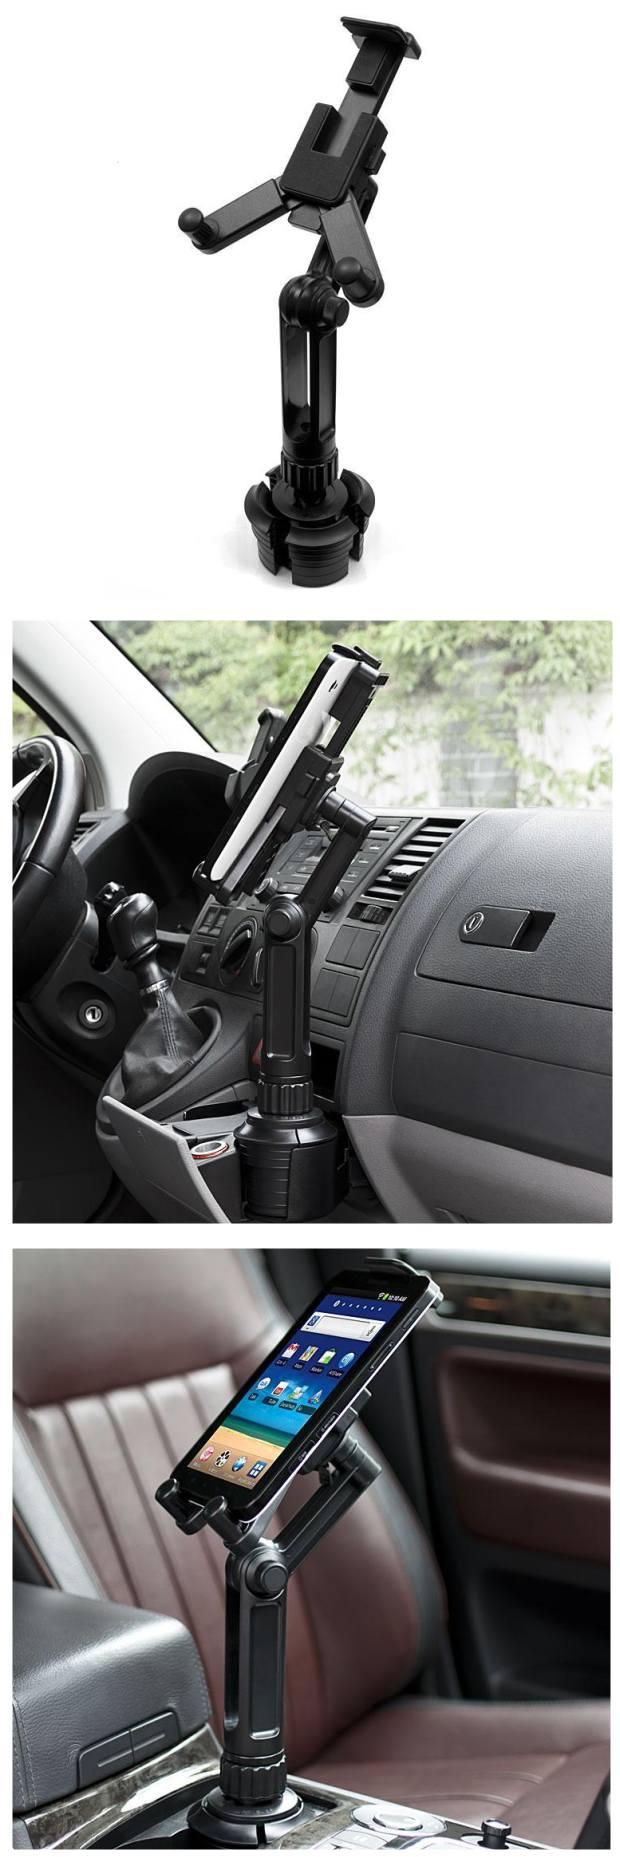 Držiak do auta Roxa CT06 pro Váš tablet